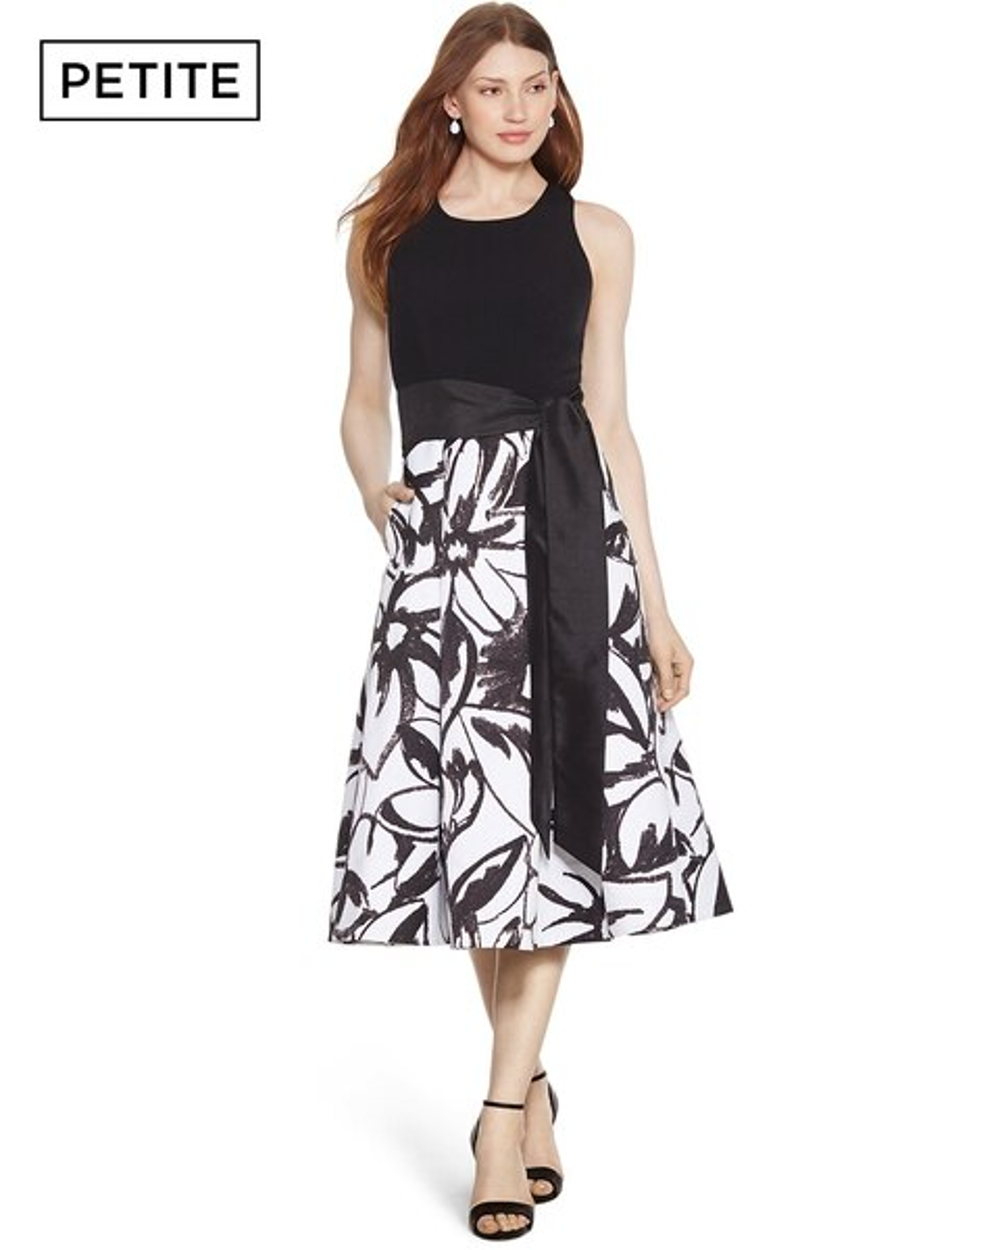 484f9e18a7d9 Petite Halter Black and White Print Midi Dress - White House Black Market